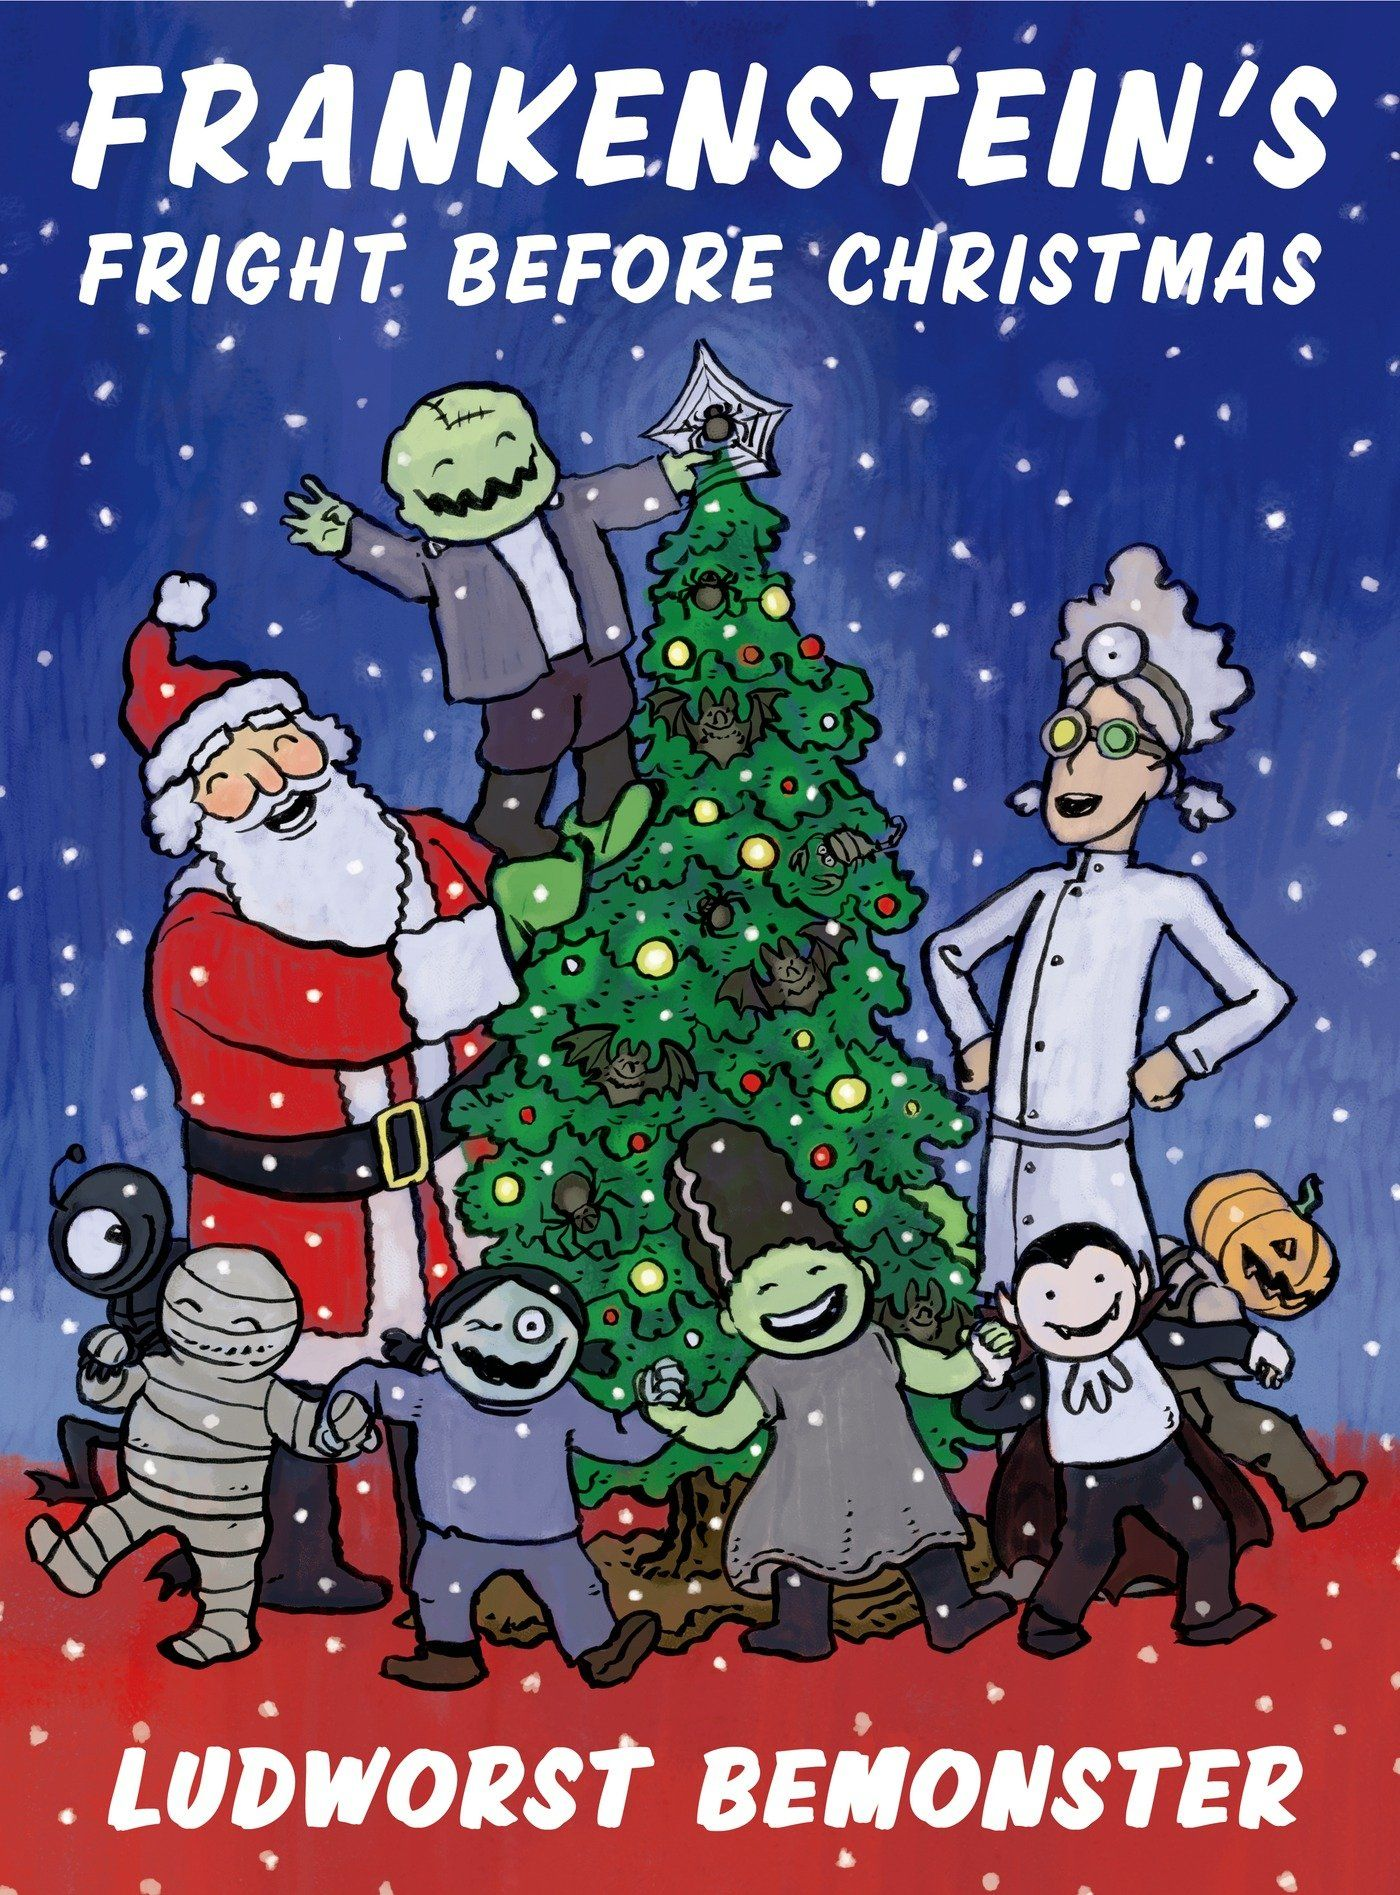 "Frankenstein's Fright Before Christmas: Rick Walton, Nathan Hale (""Ludworst Bemonster"", play on Ludwig Bemelmans illustration style for Madeline's Christmas)"